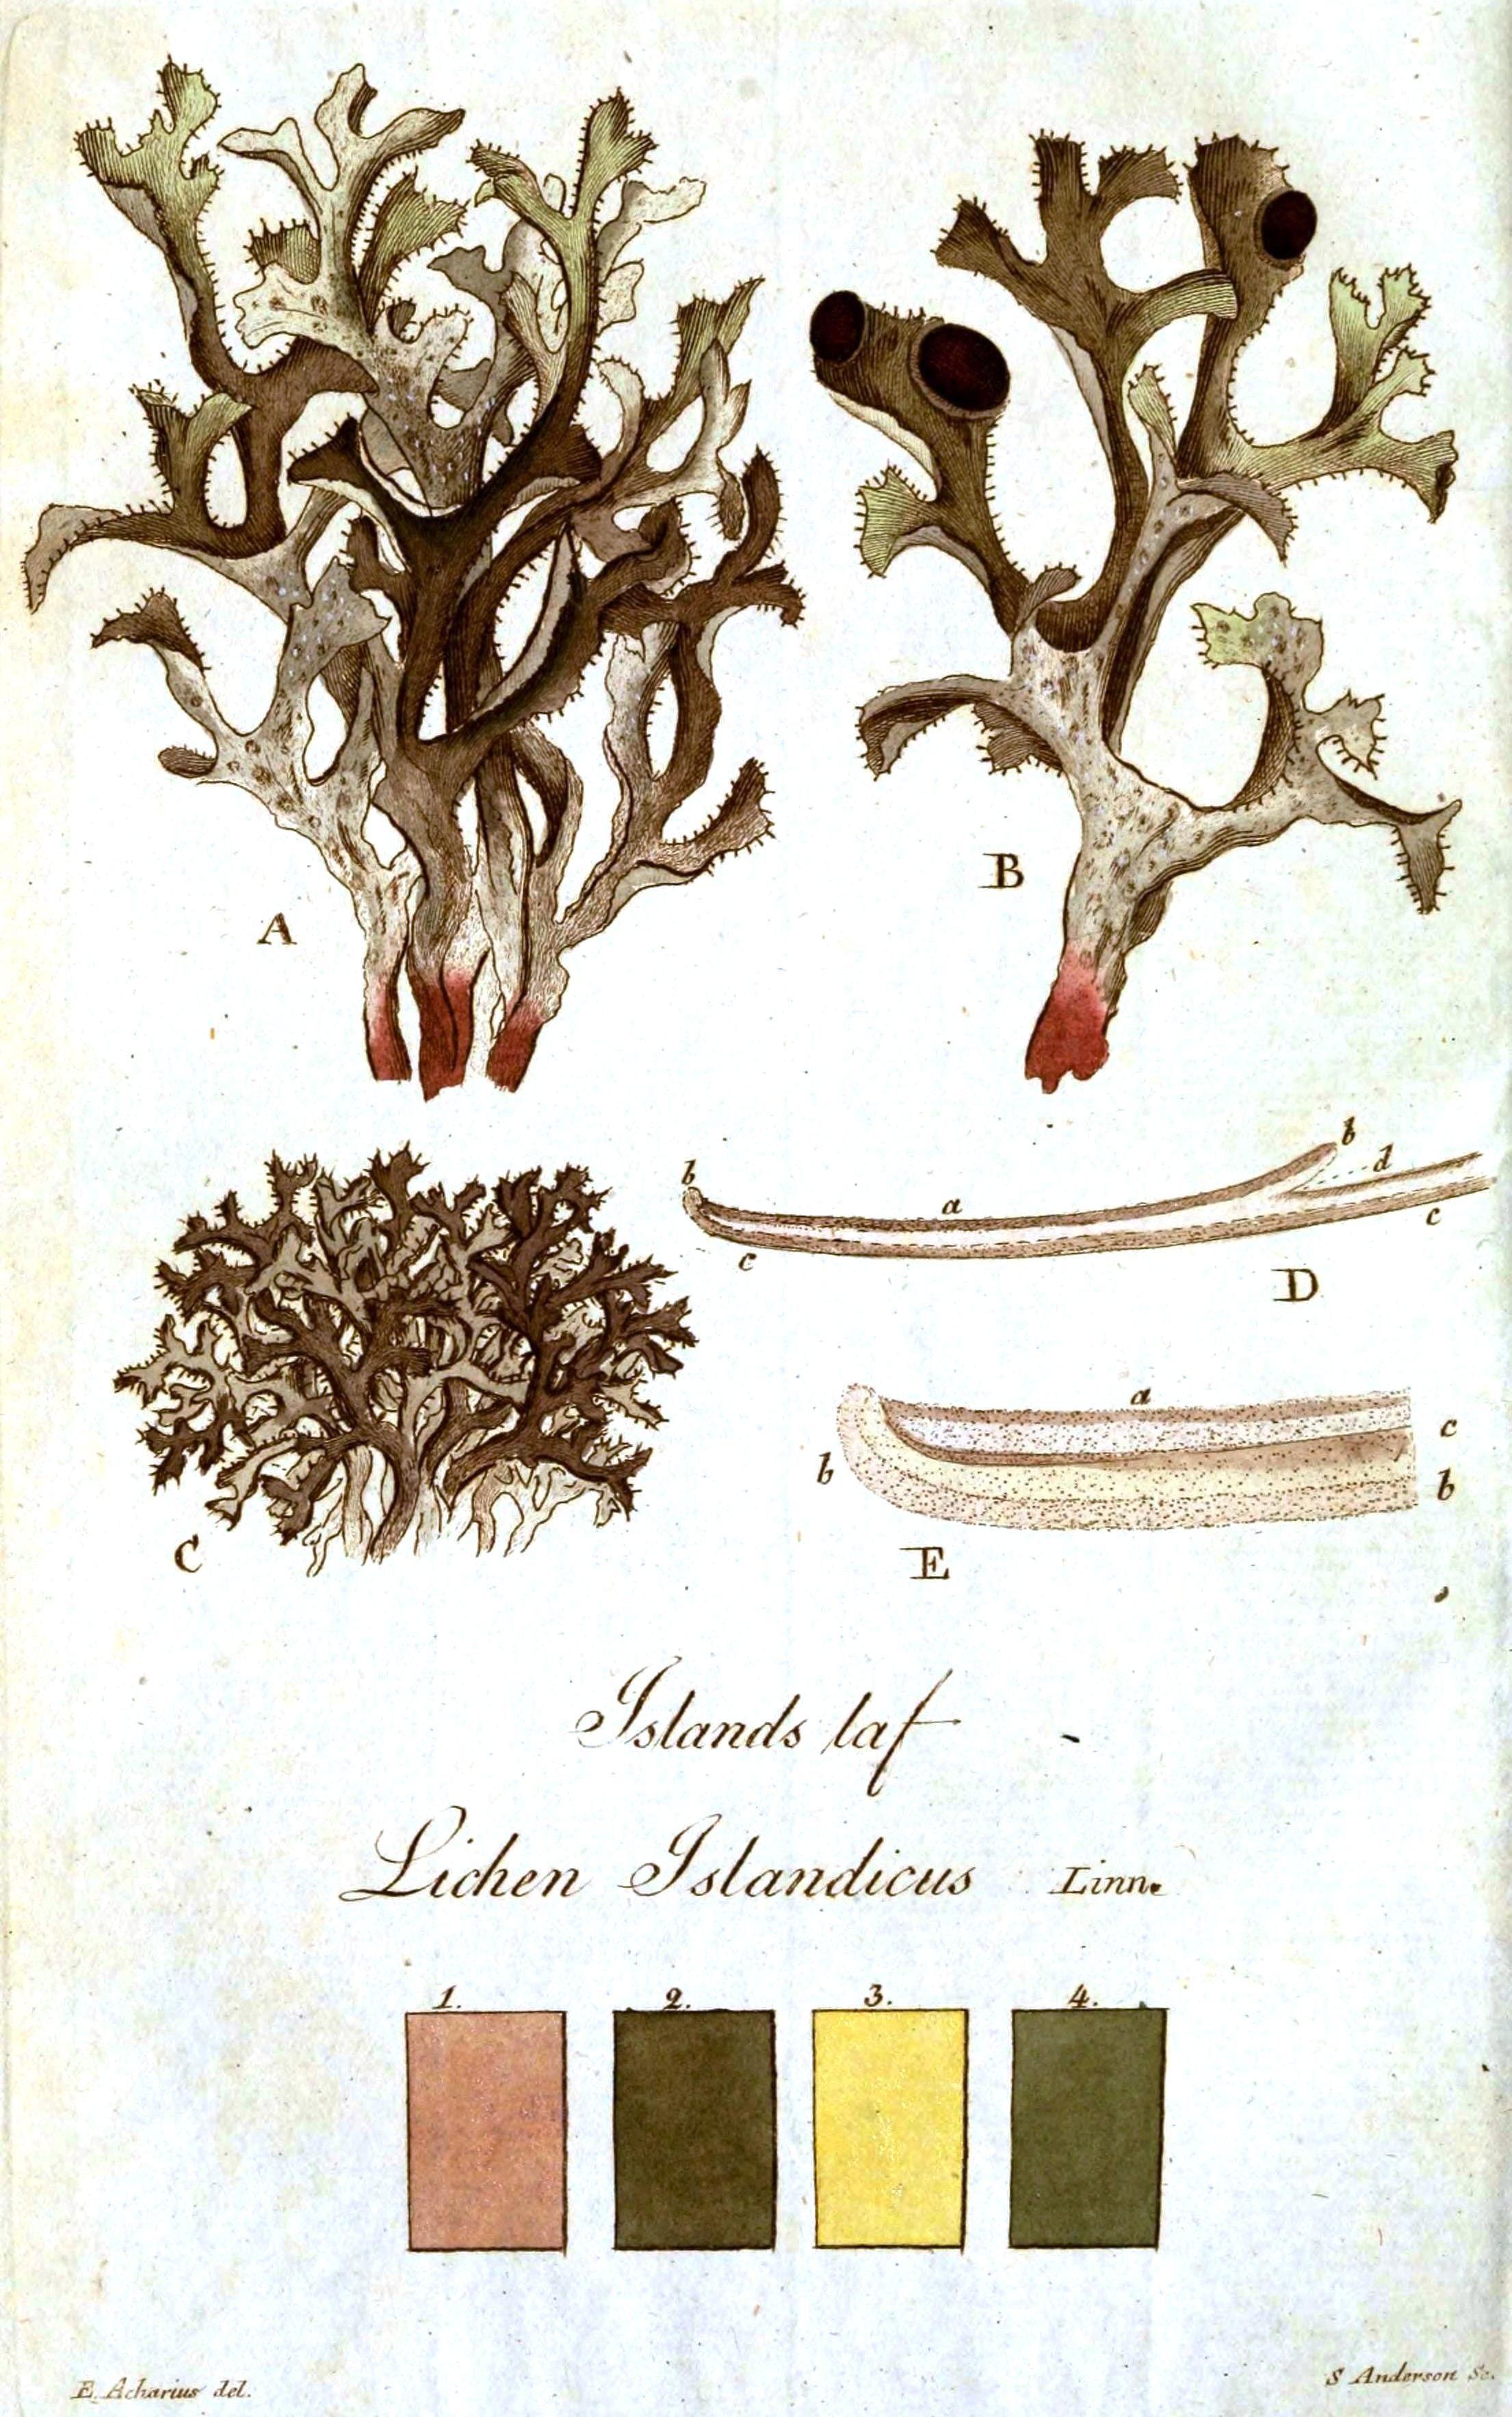 Vintage Printables | Mycology | Free Printable Art, Vintage Art - Free Printable Vintage Art